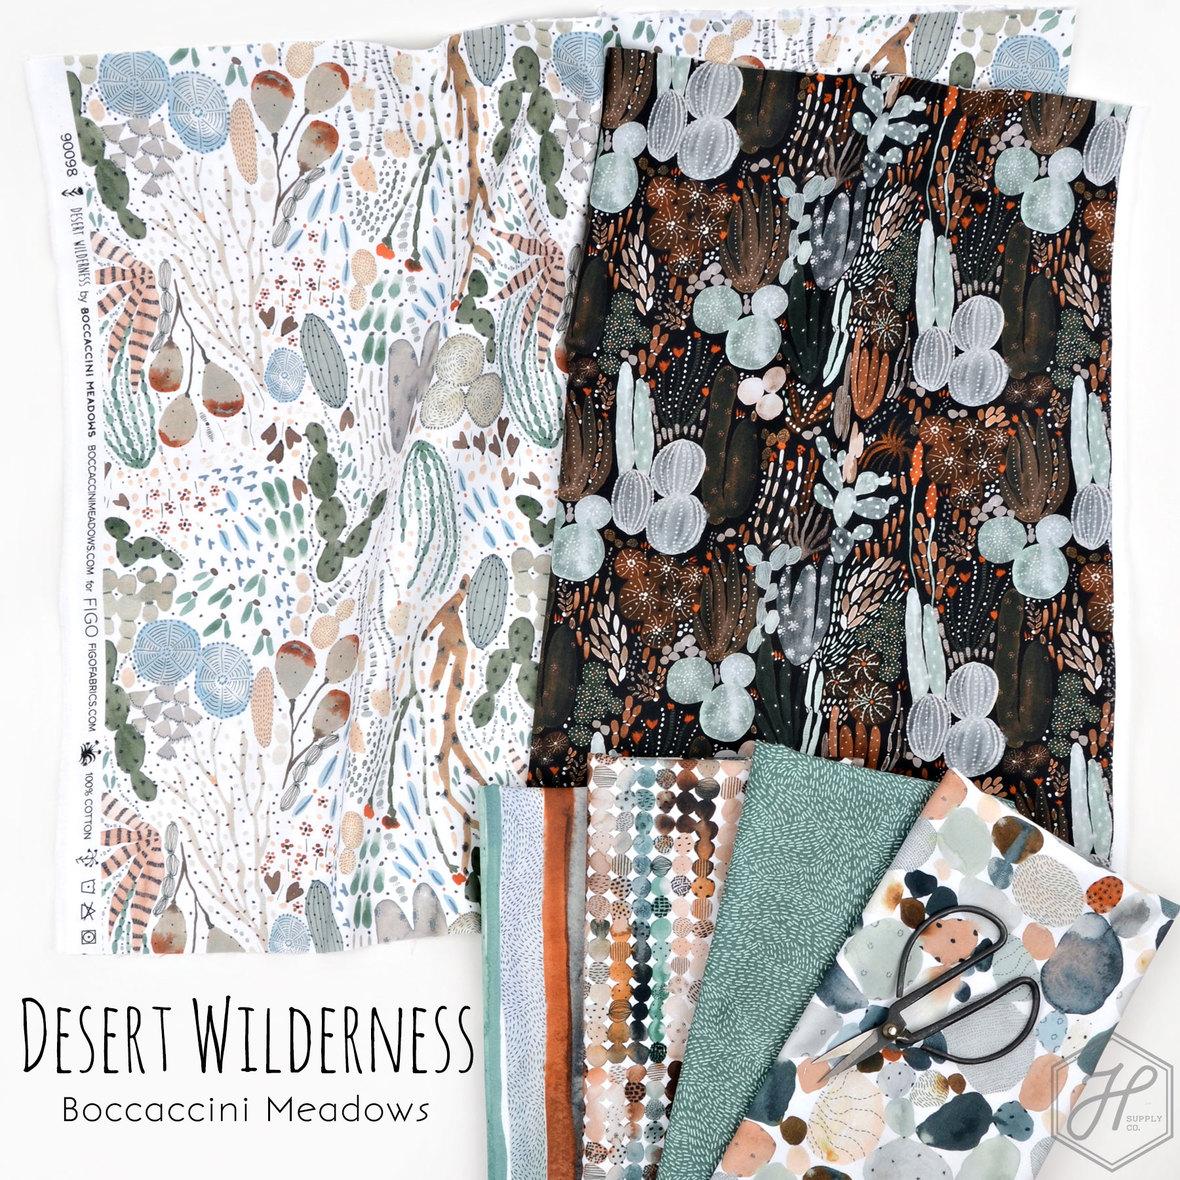 Desert-Wilderness-2--fabric-Boccaccini-Meadows-Figo-at-Hawthorne-Supply-Co